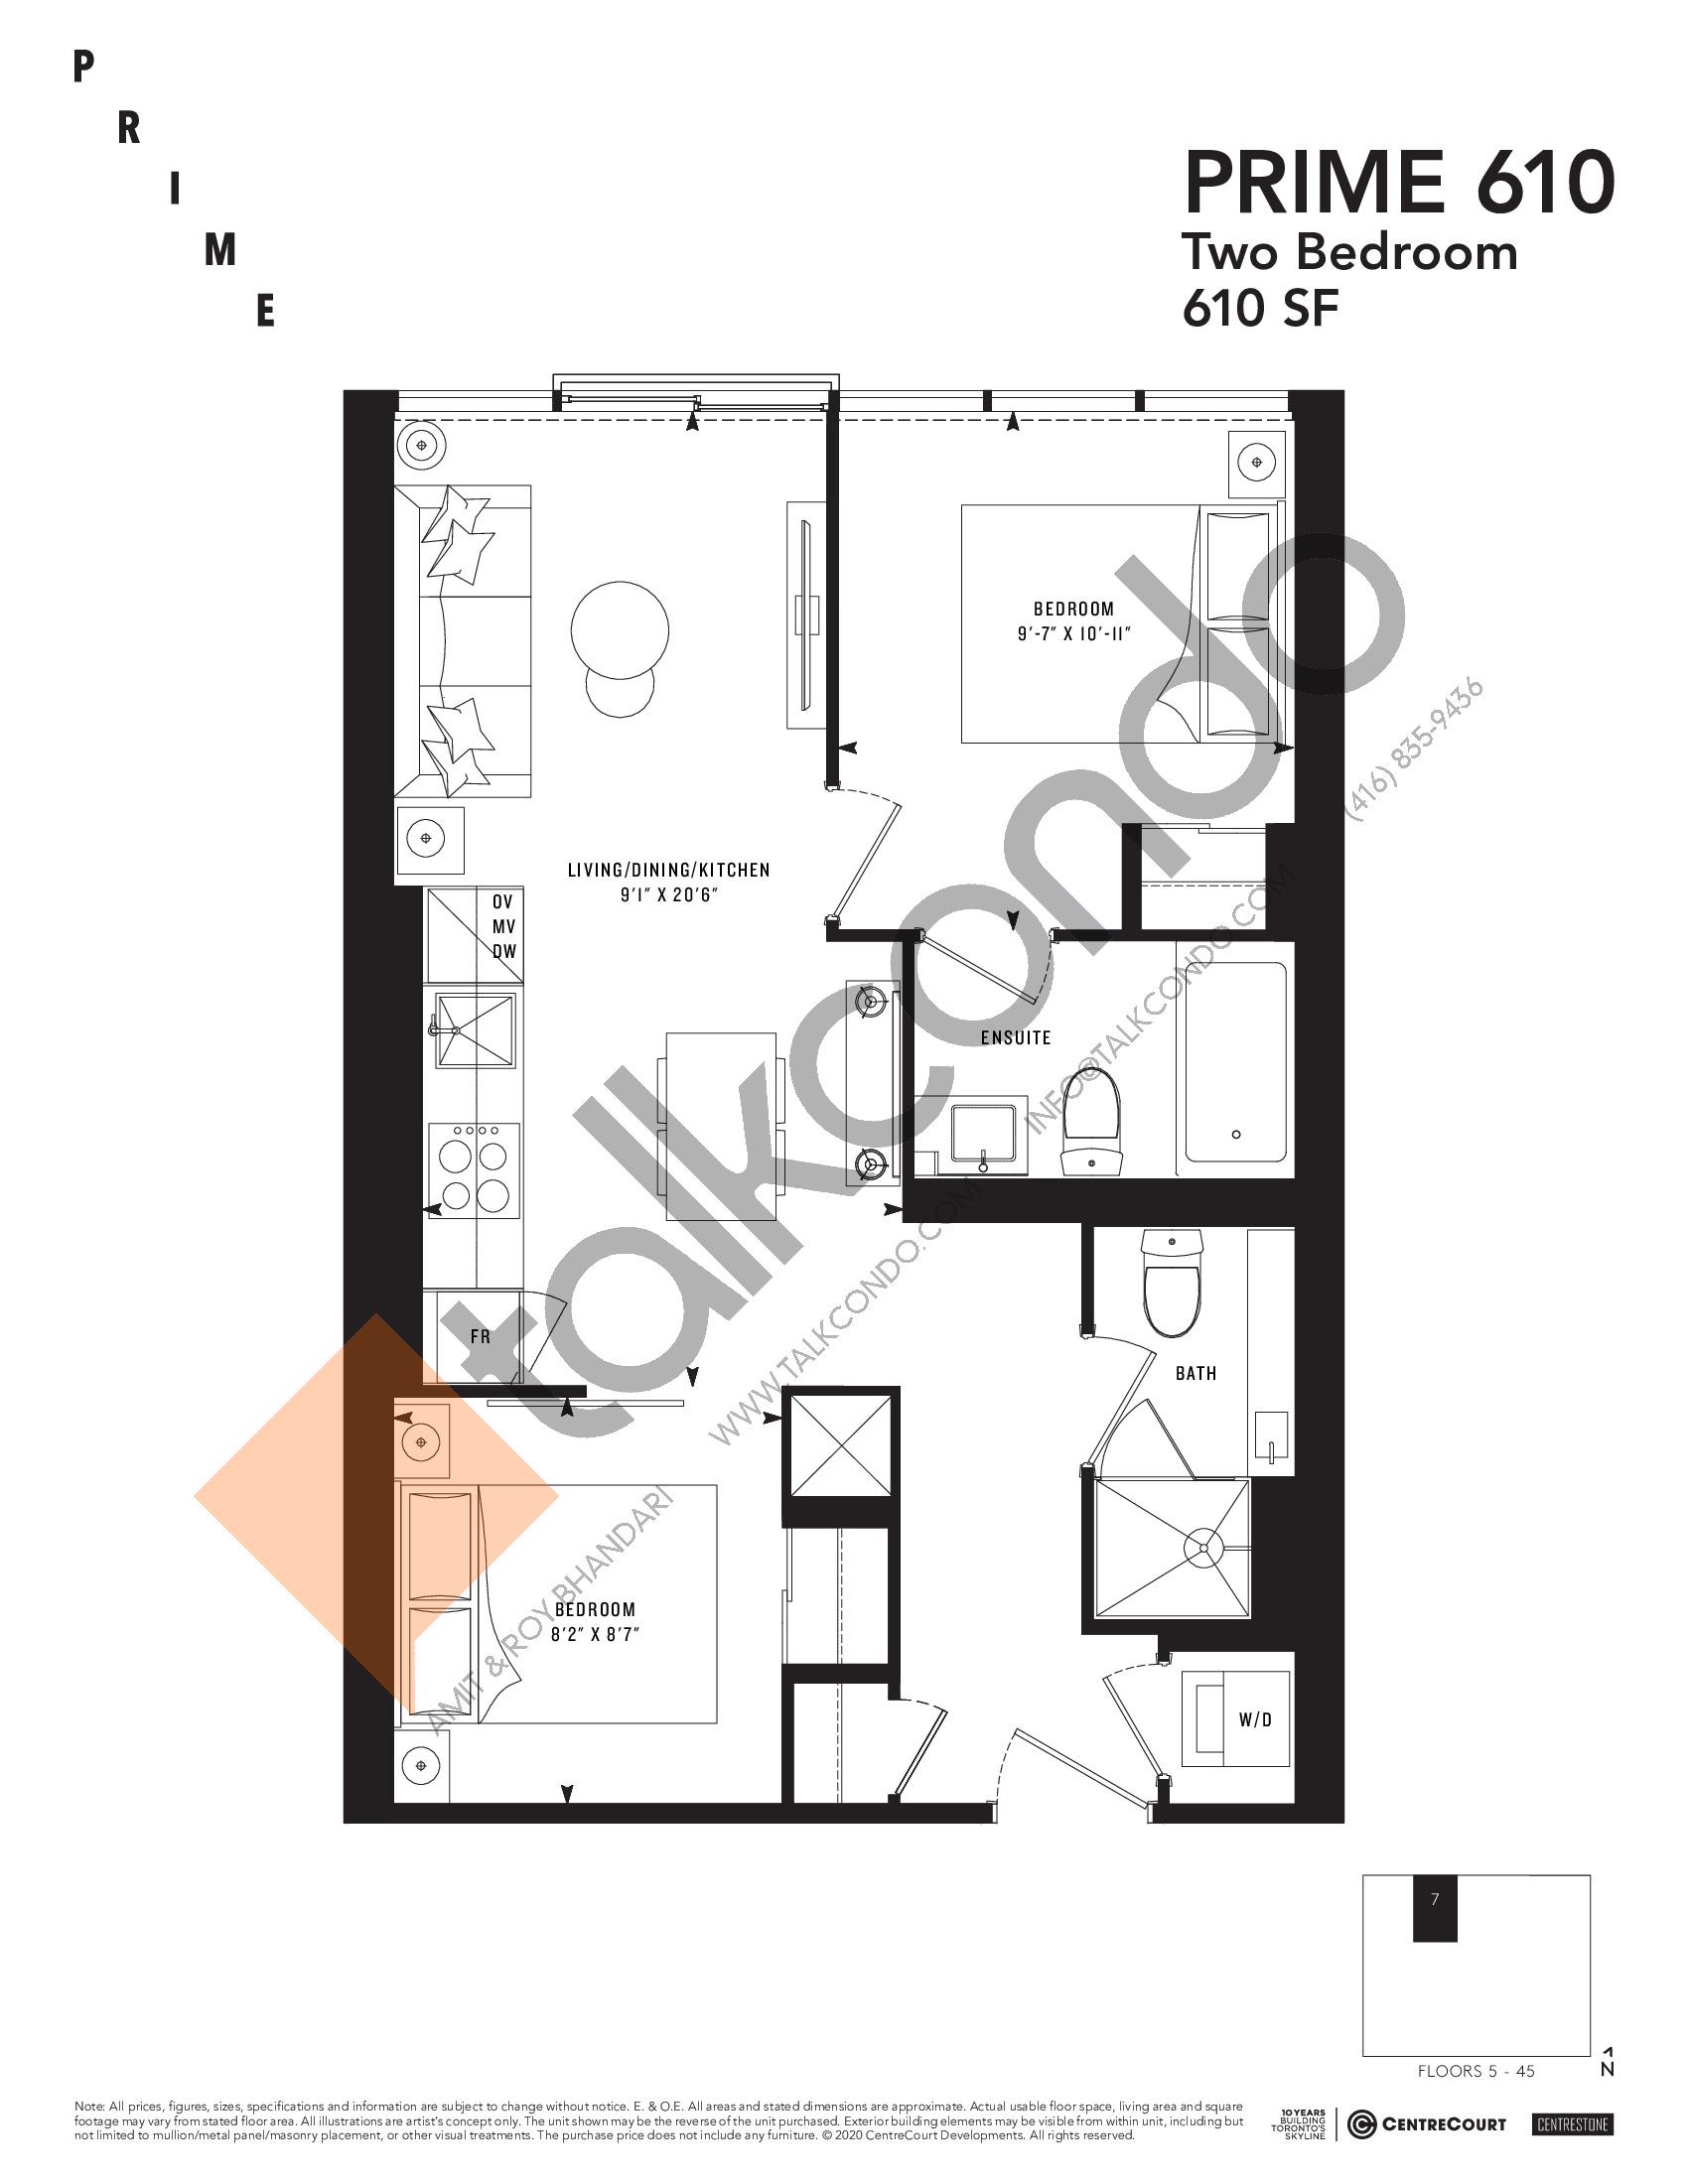 PRIME 610 Floor Plan at Prime Condos - 610 sq.ft